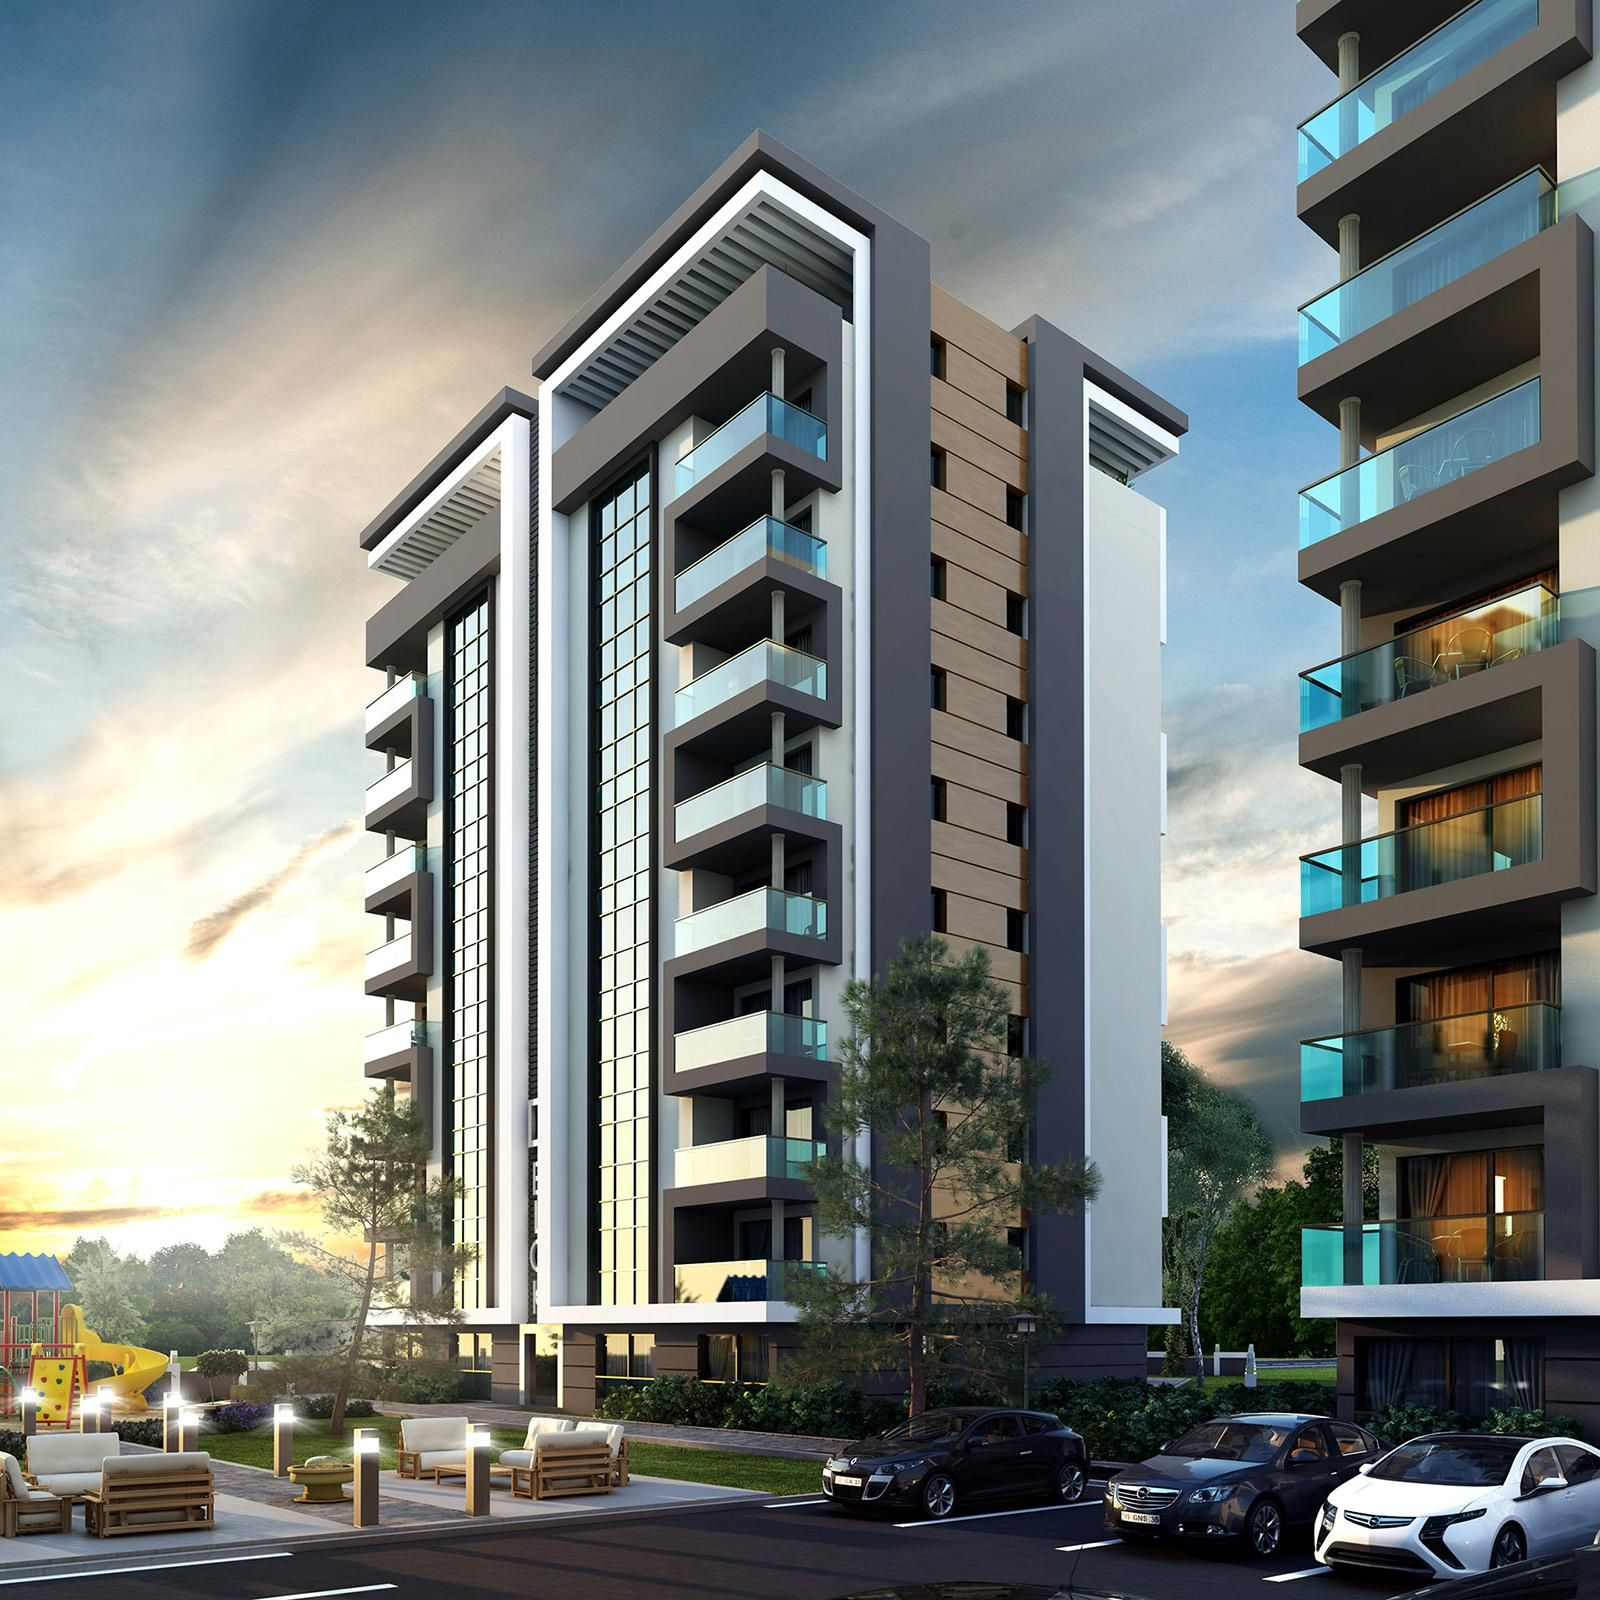 Alparslan Konutları Building Facade Exterior Elevation Residential Design